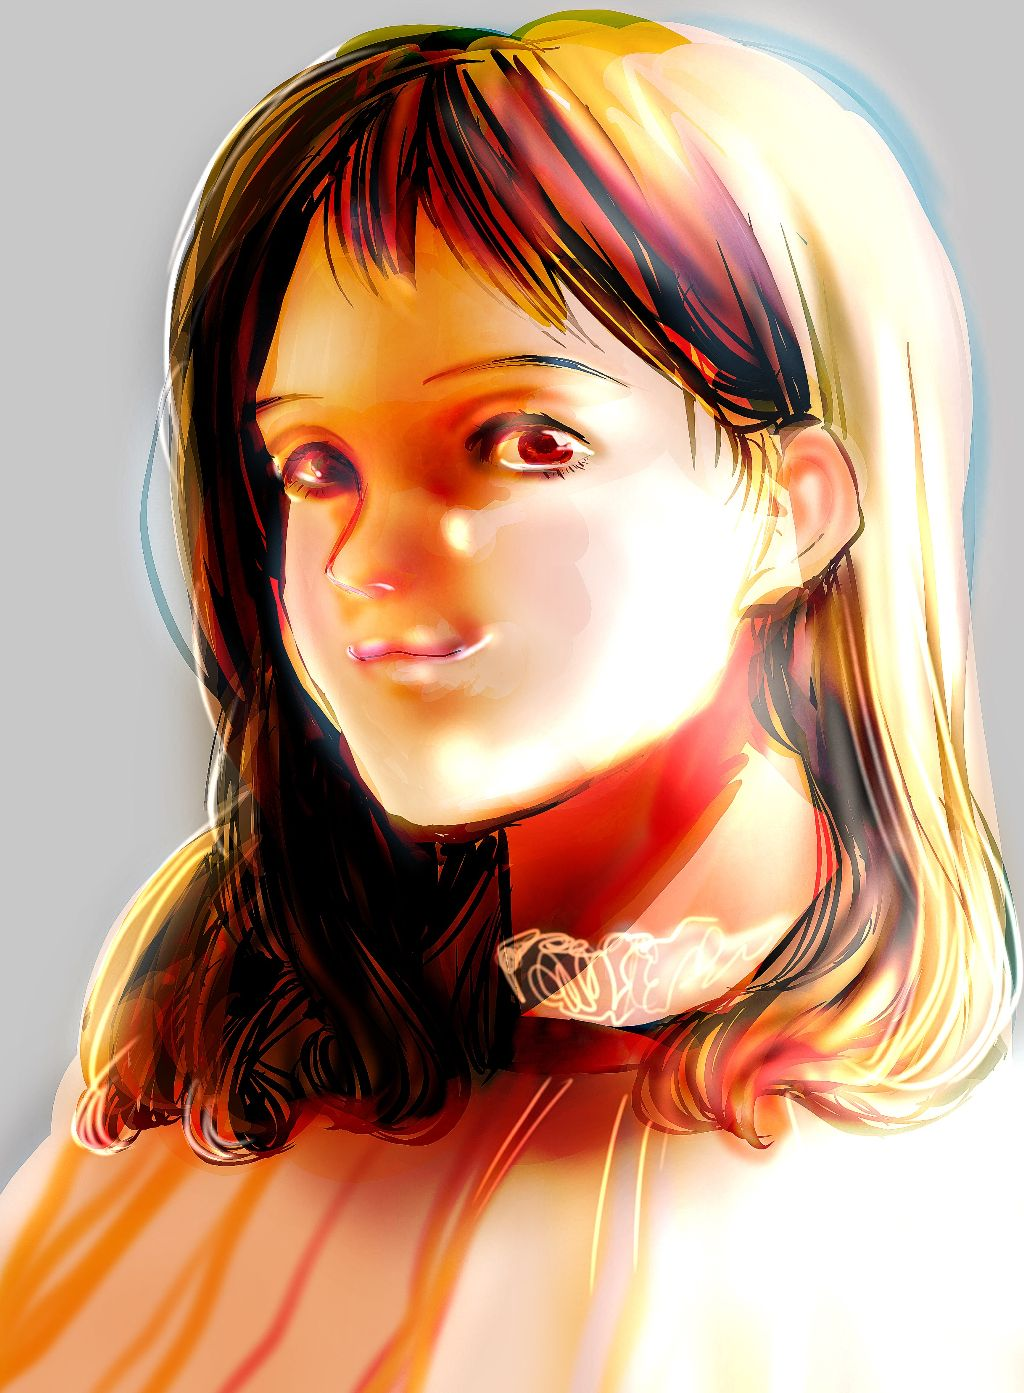 #art #illustration #drawing #sketch #girl